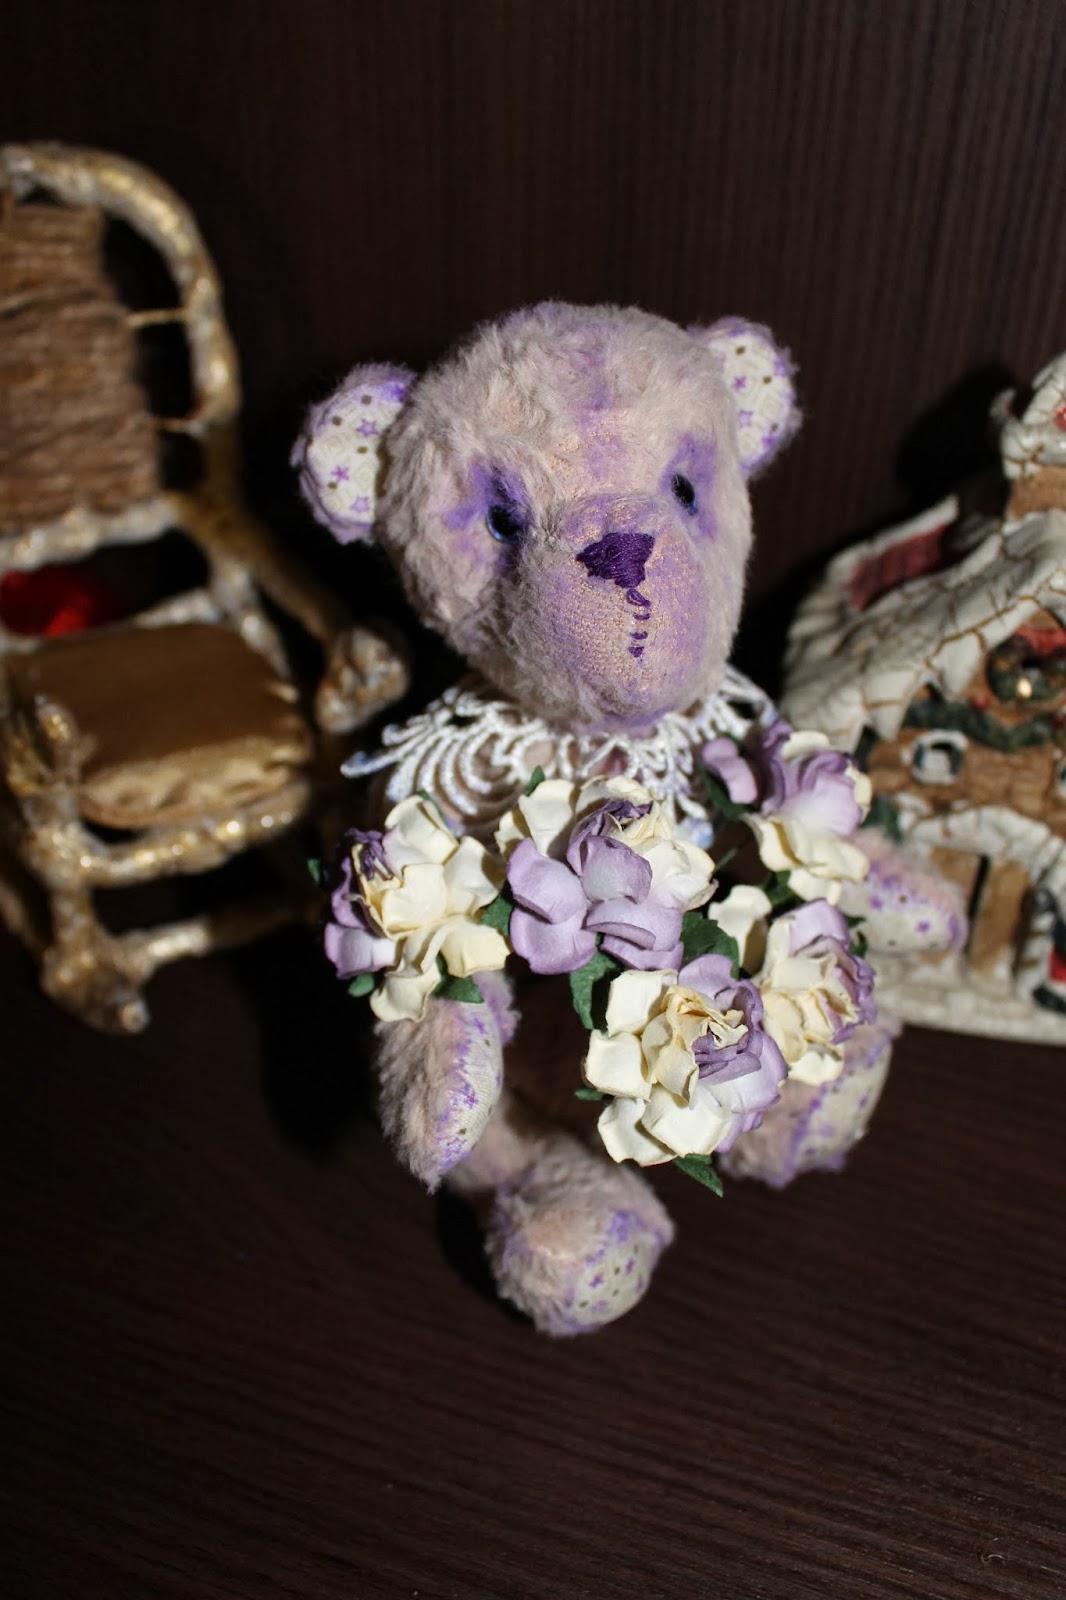 Розовый мишка Тедди